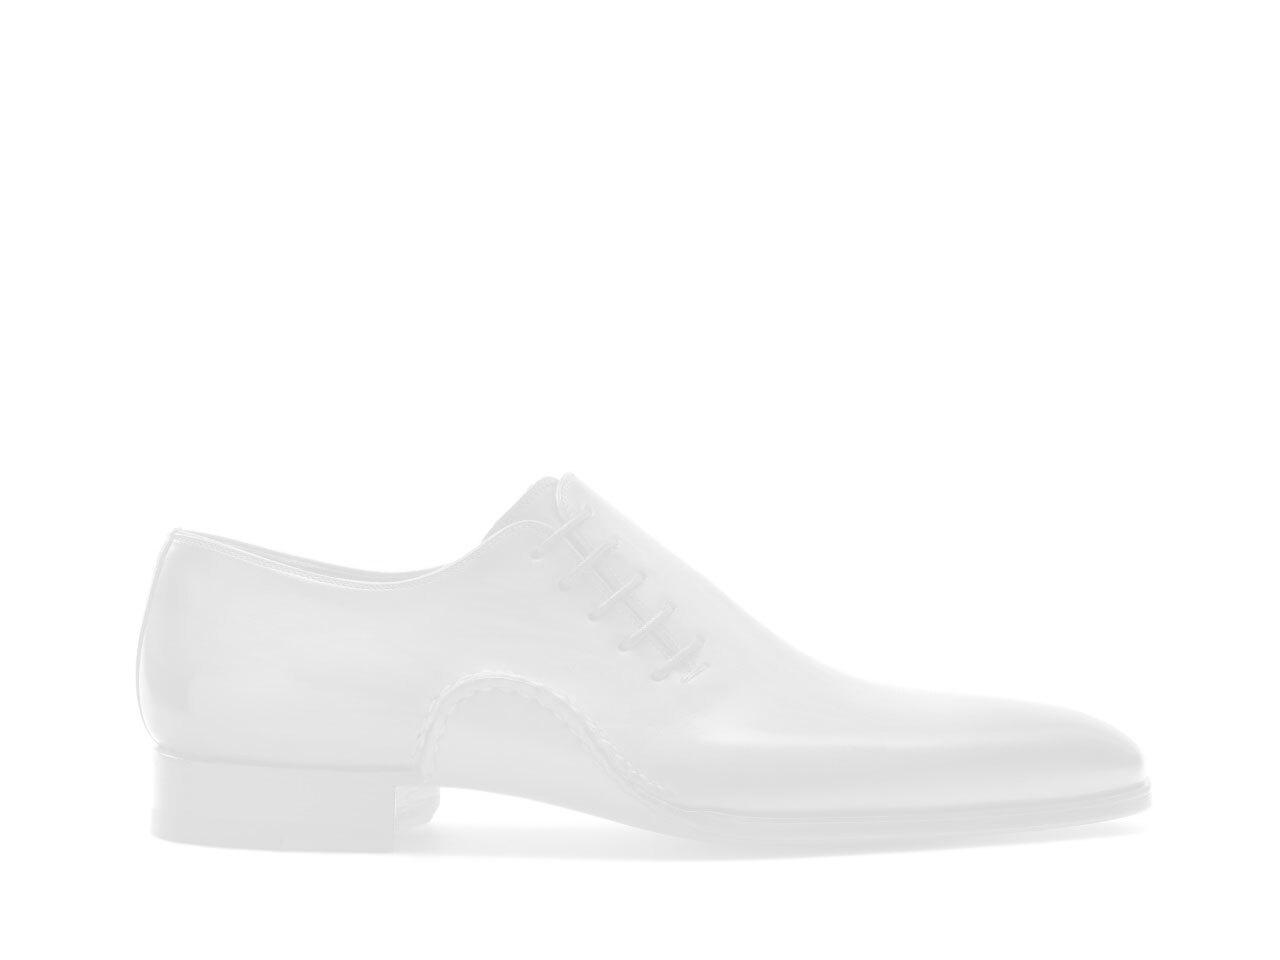 Pair of the Magnanni Ecija Navy Men's Sneakers